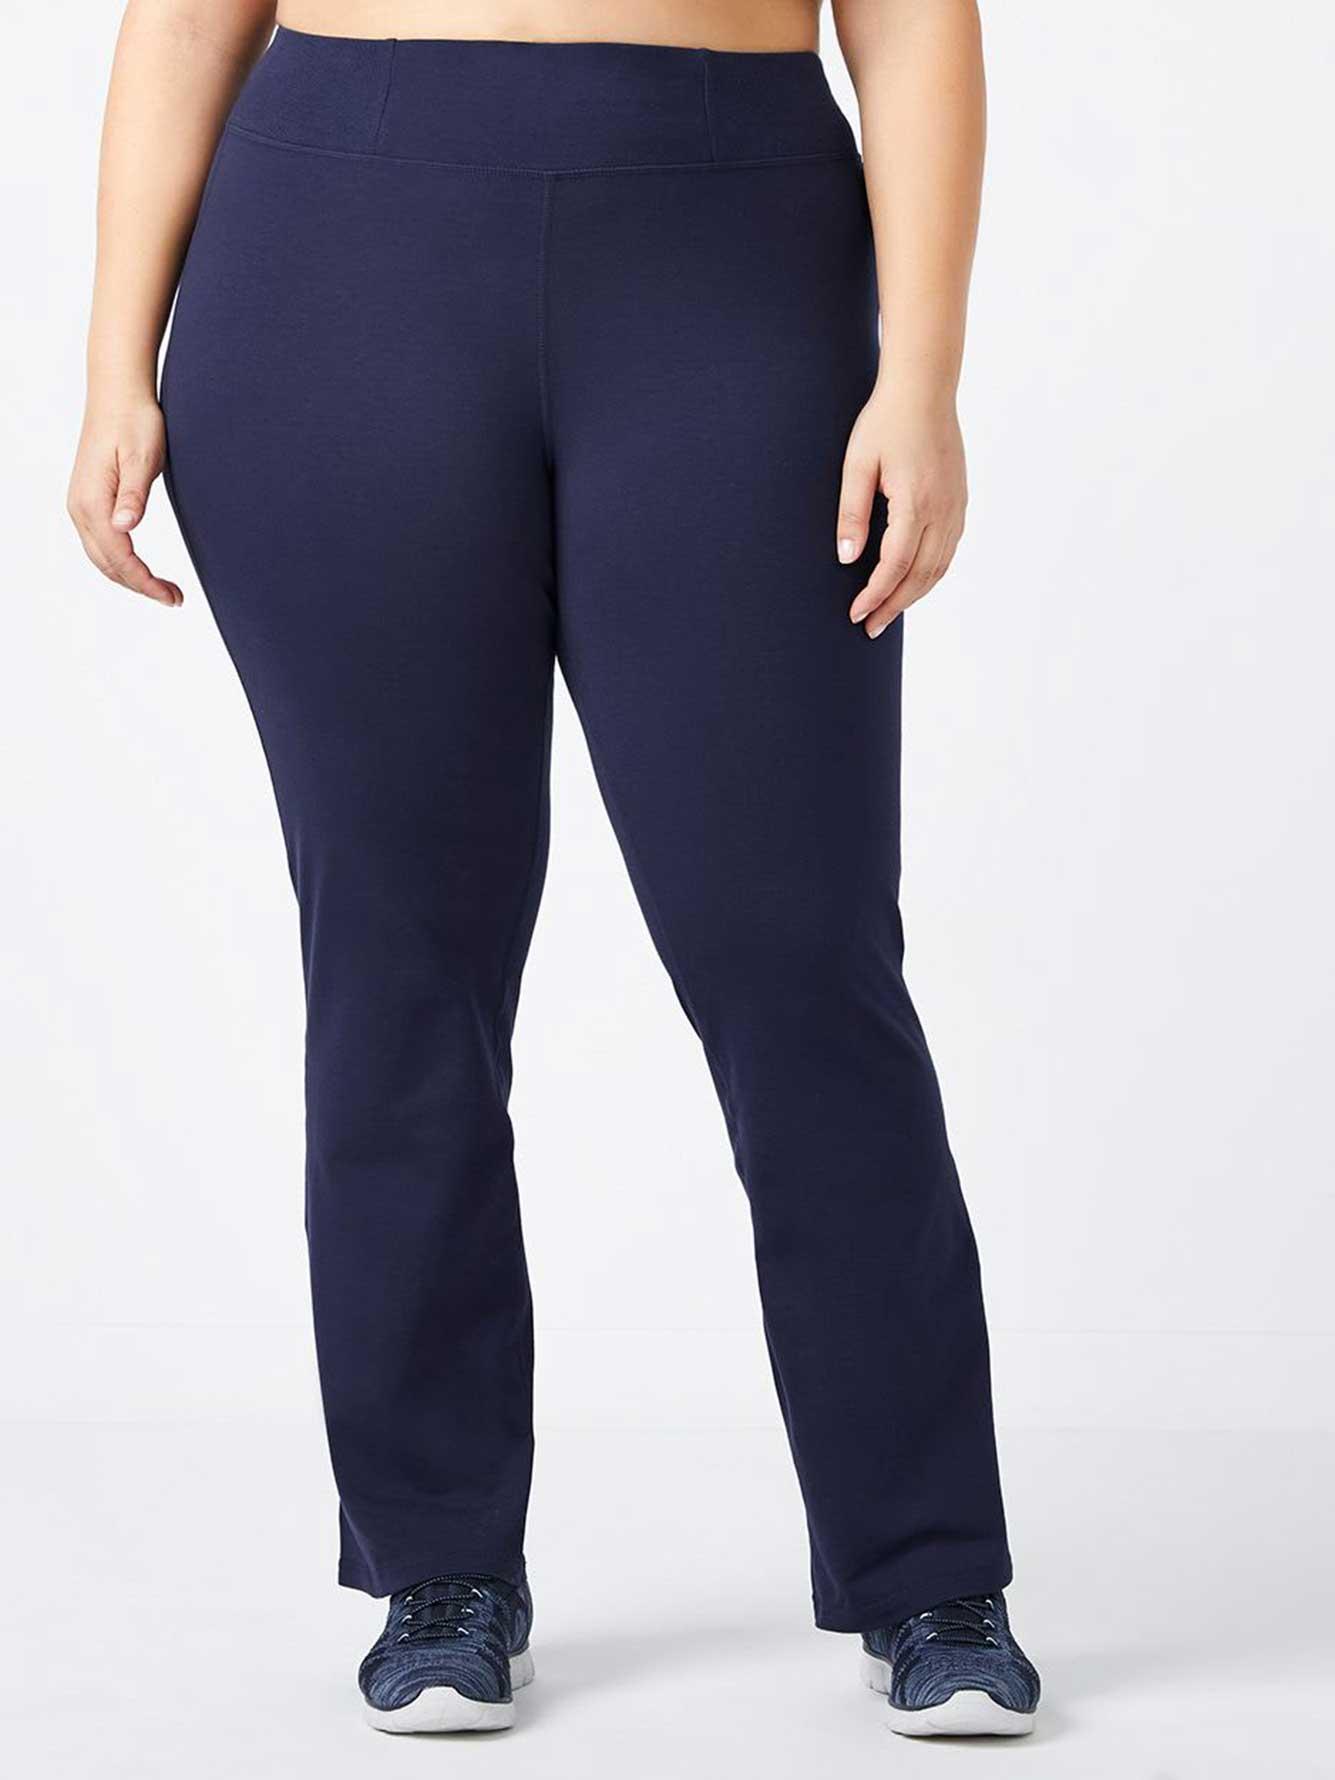 4dca0654d6688 Petite - Plus-Size Basic Yoga Pant | Penningtons